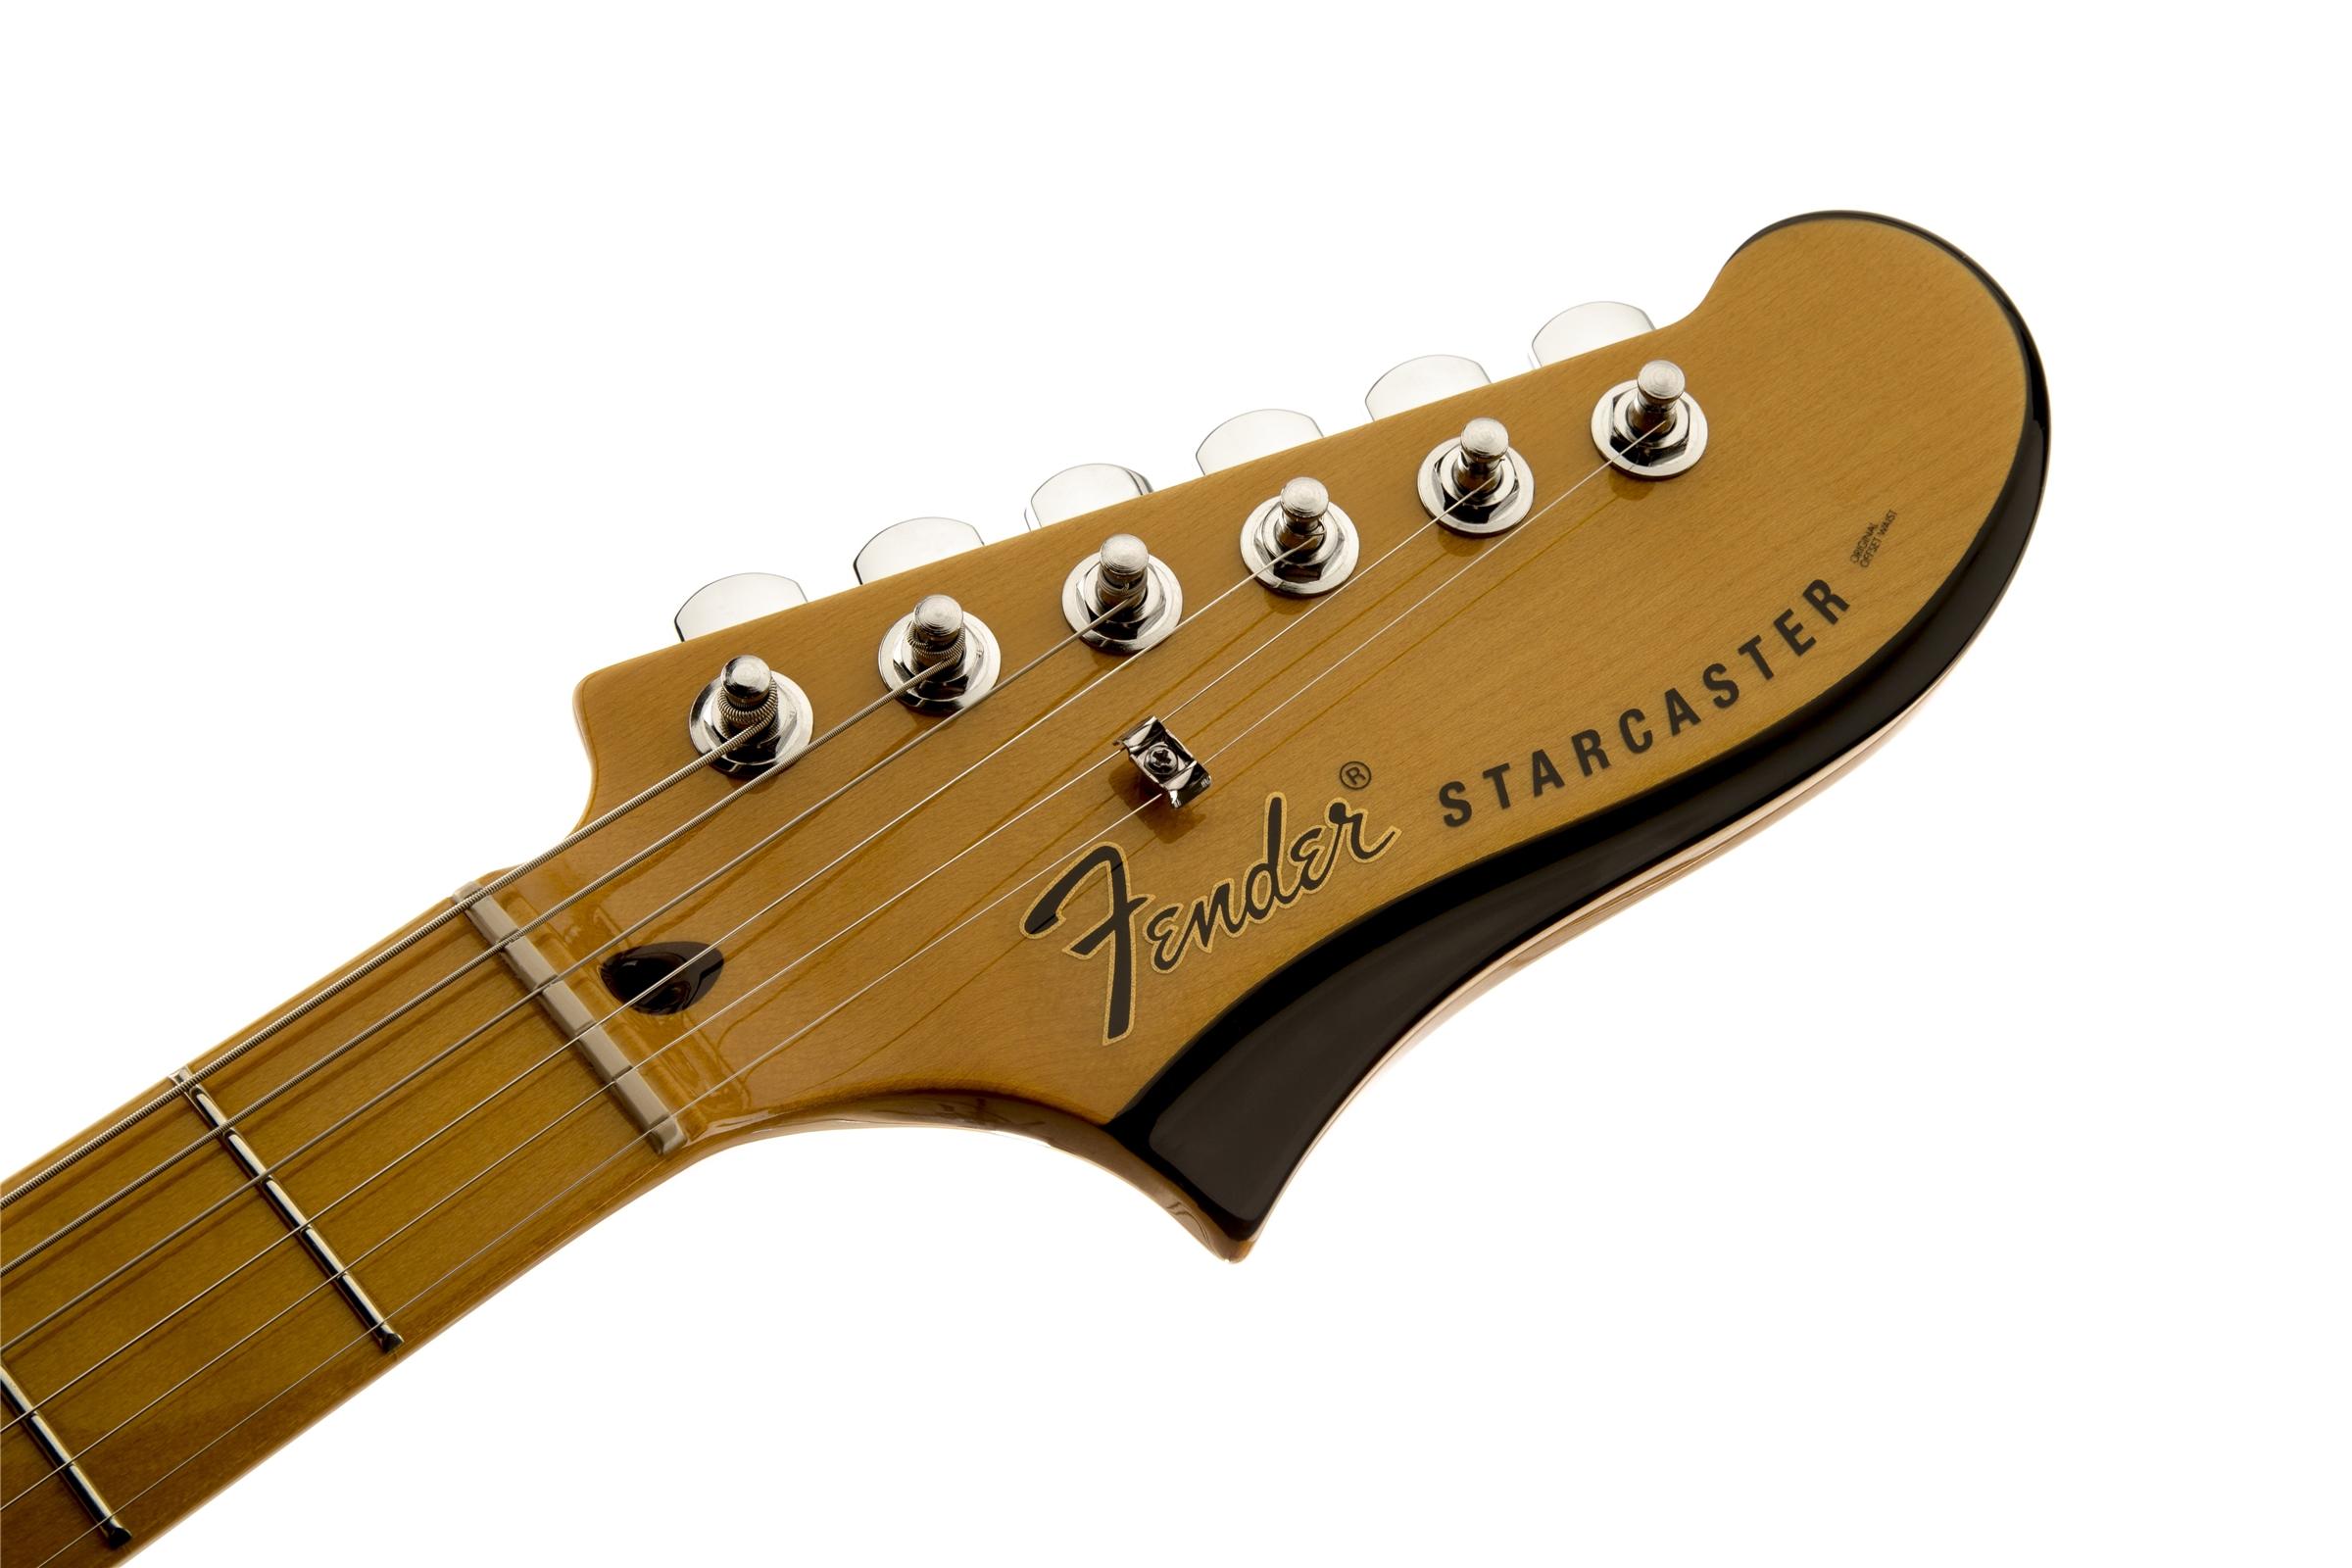 Fender starcaster key generator